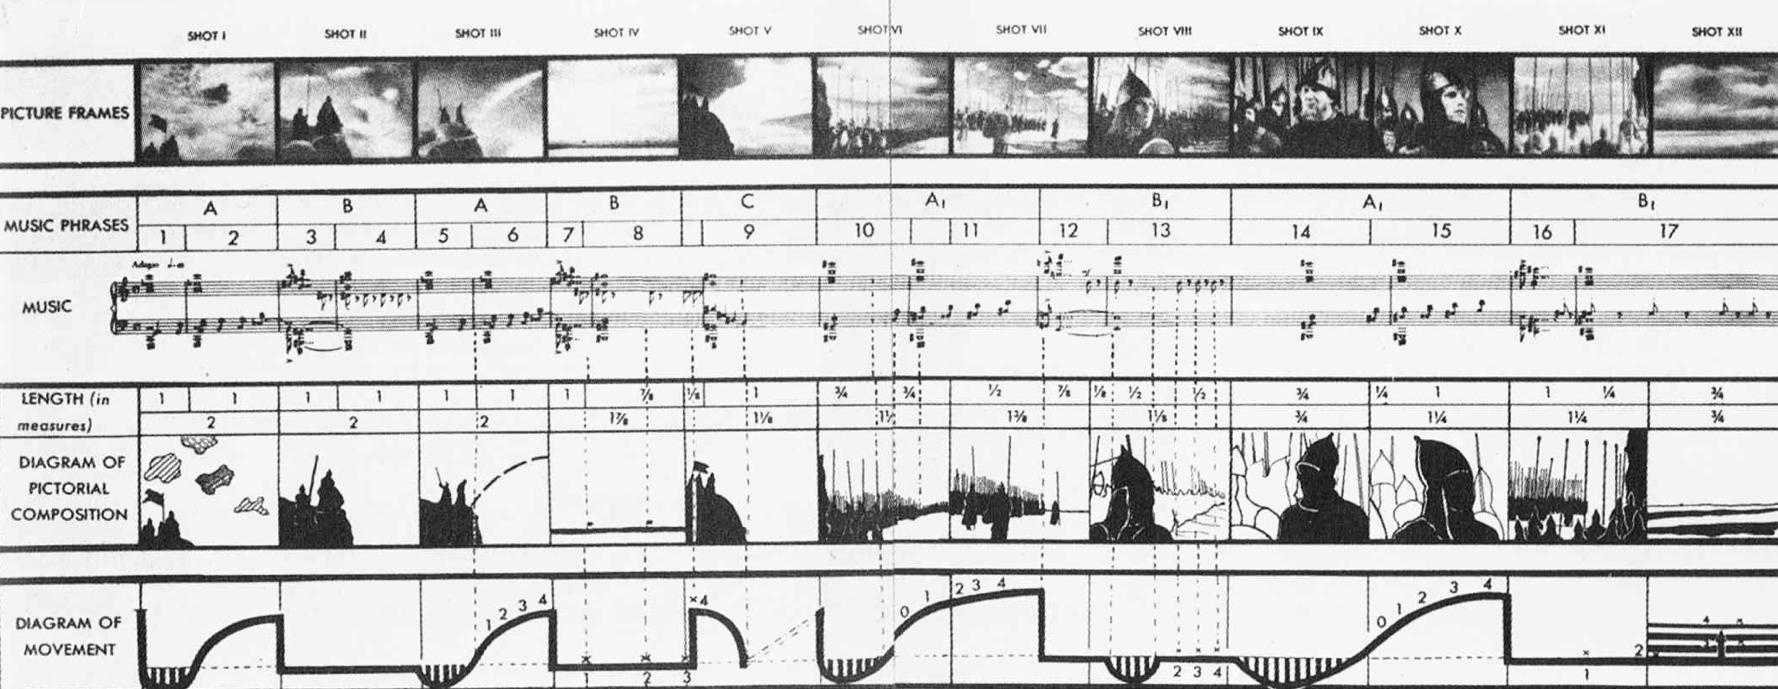 Sergei Eisenstein - montage structure of a sequence from ...